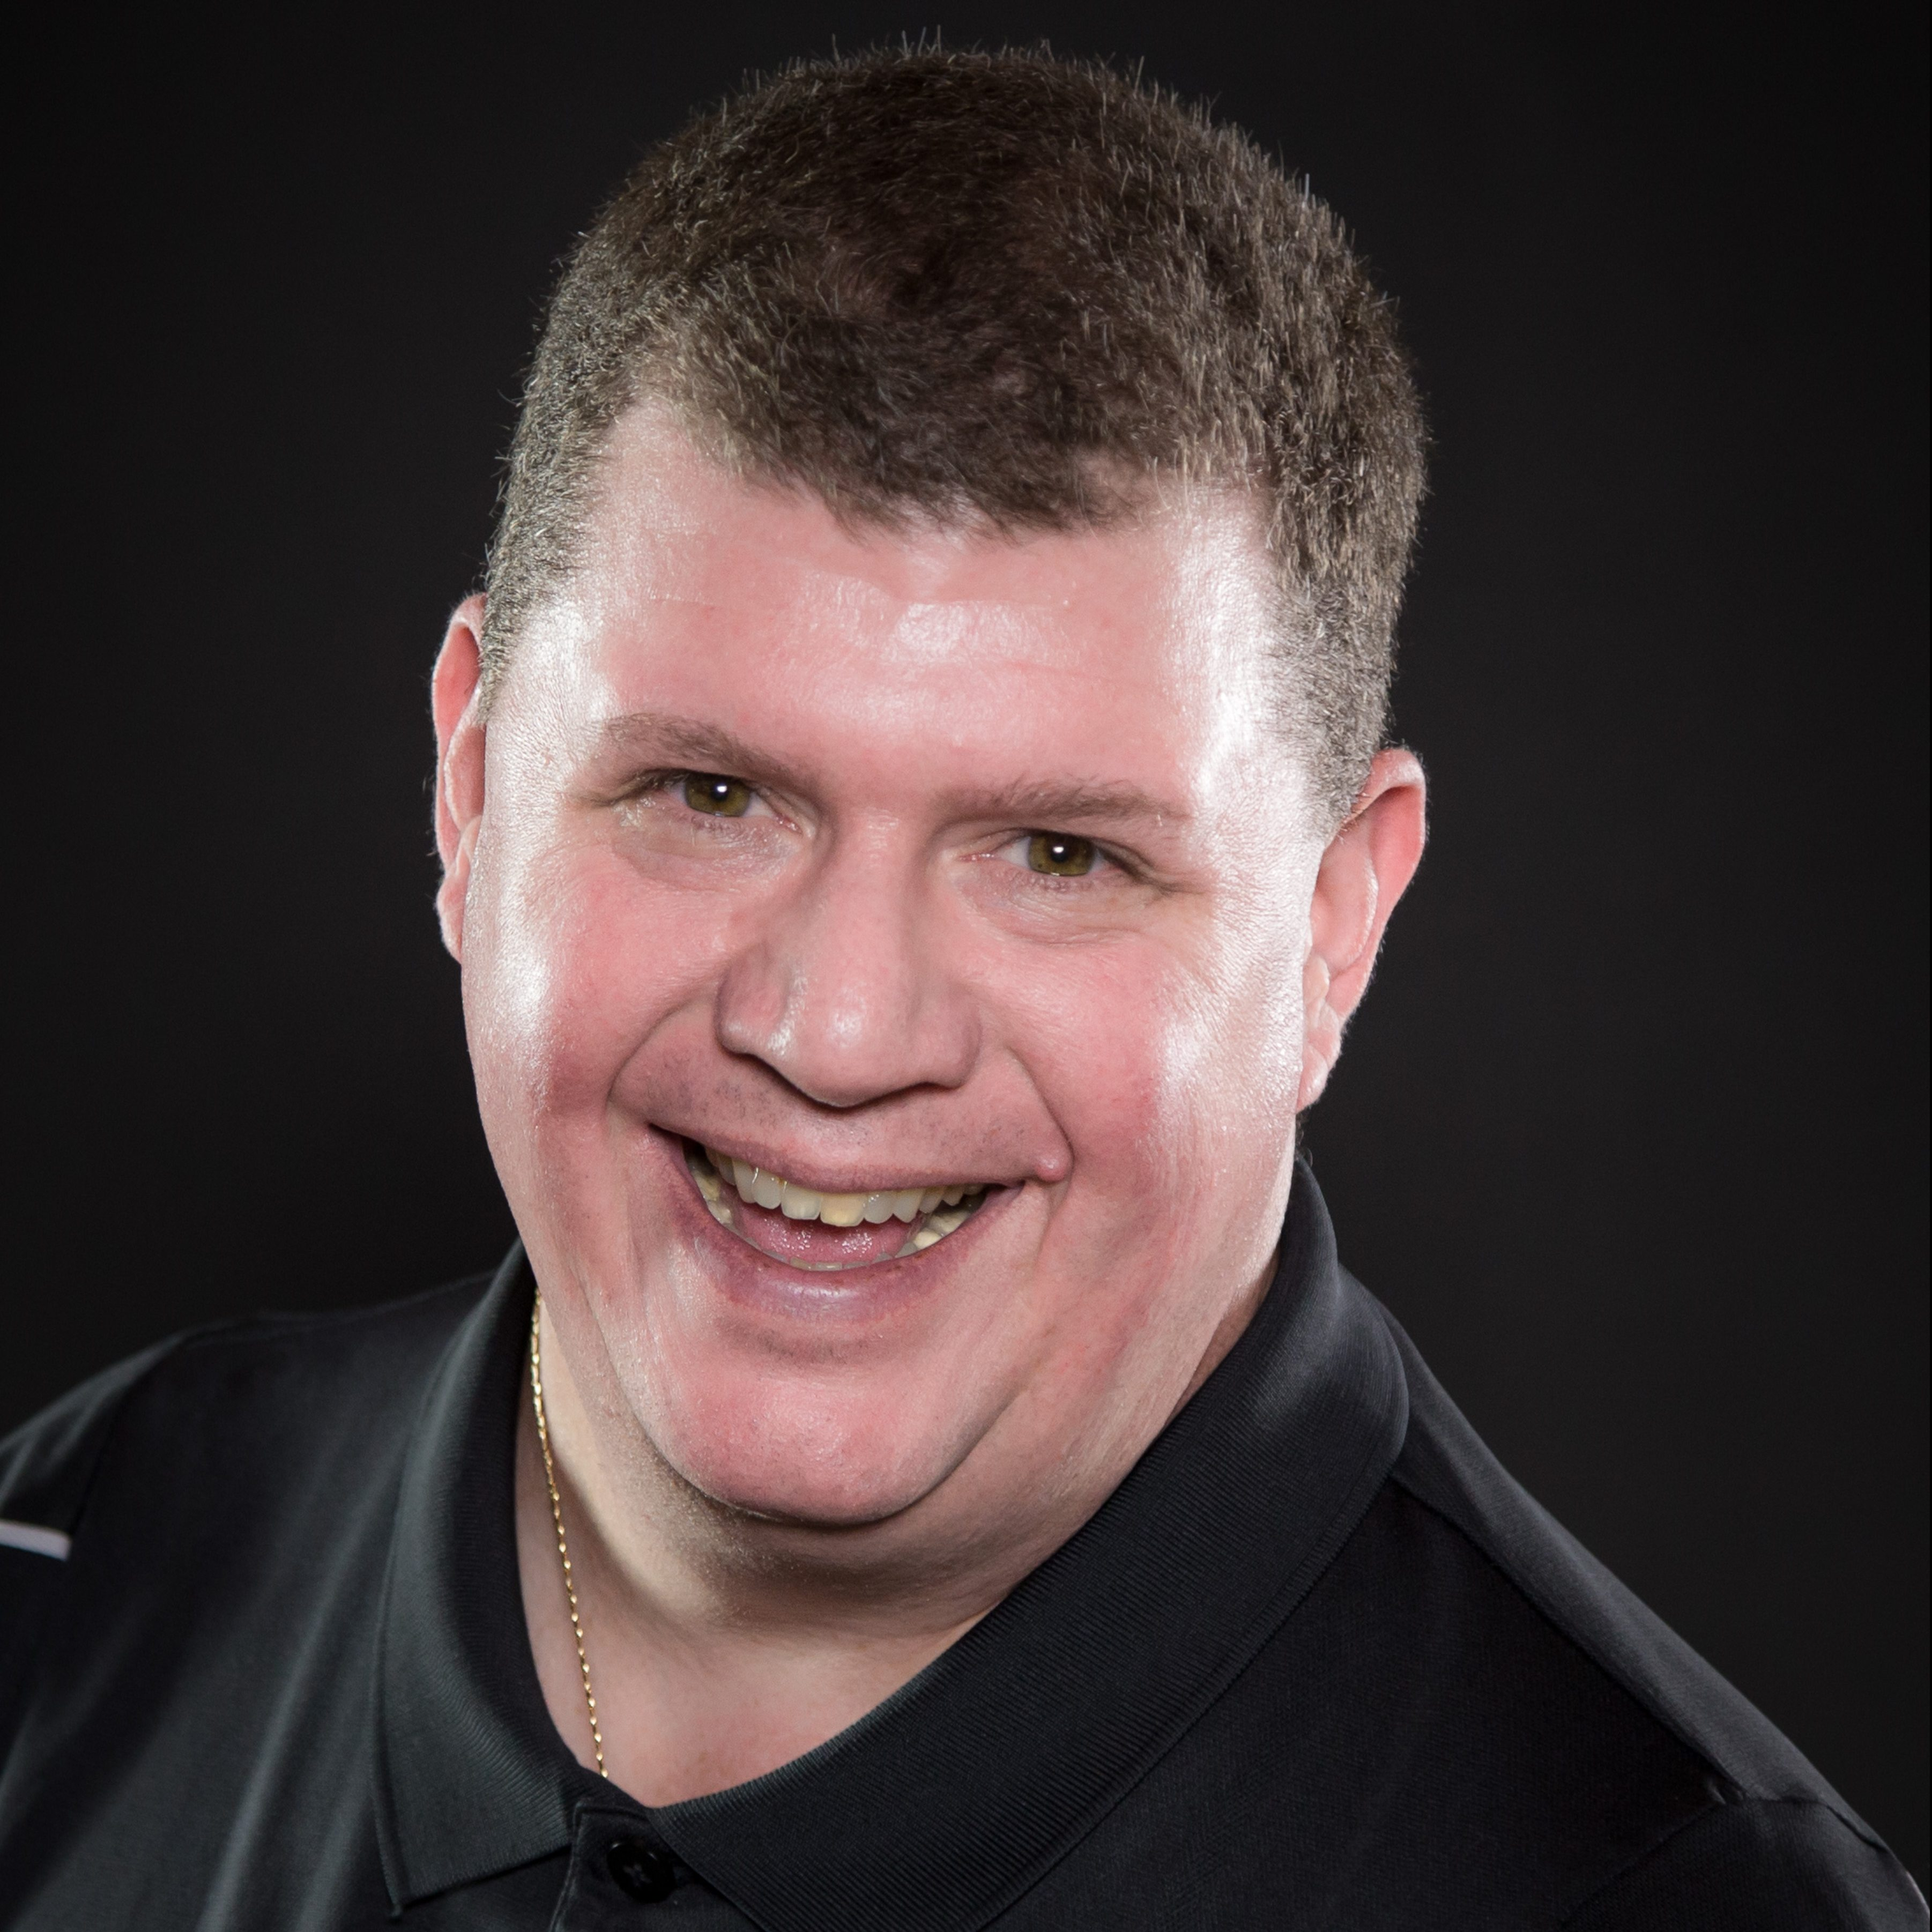 Rick A. Morris - Project Management Influencers